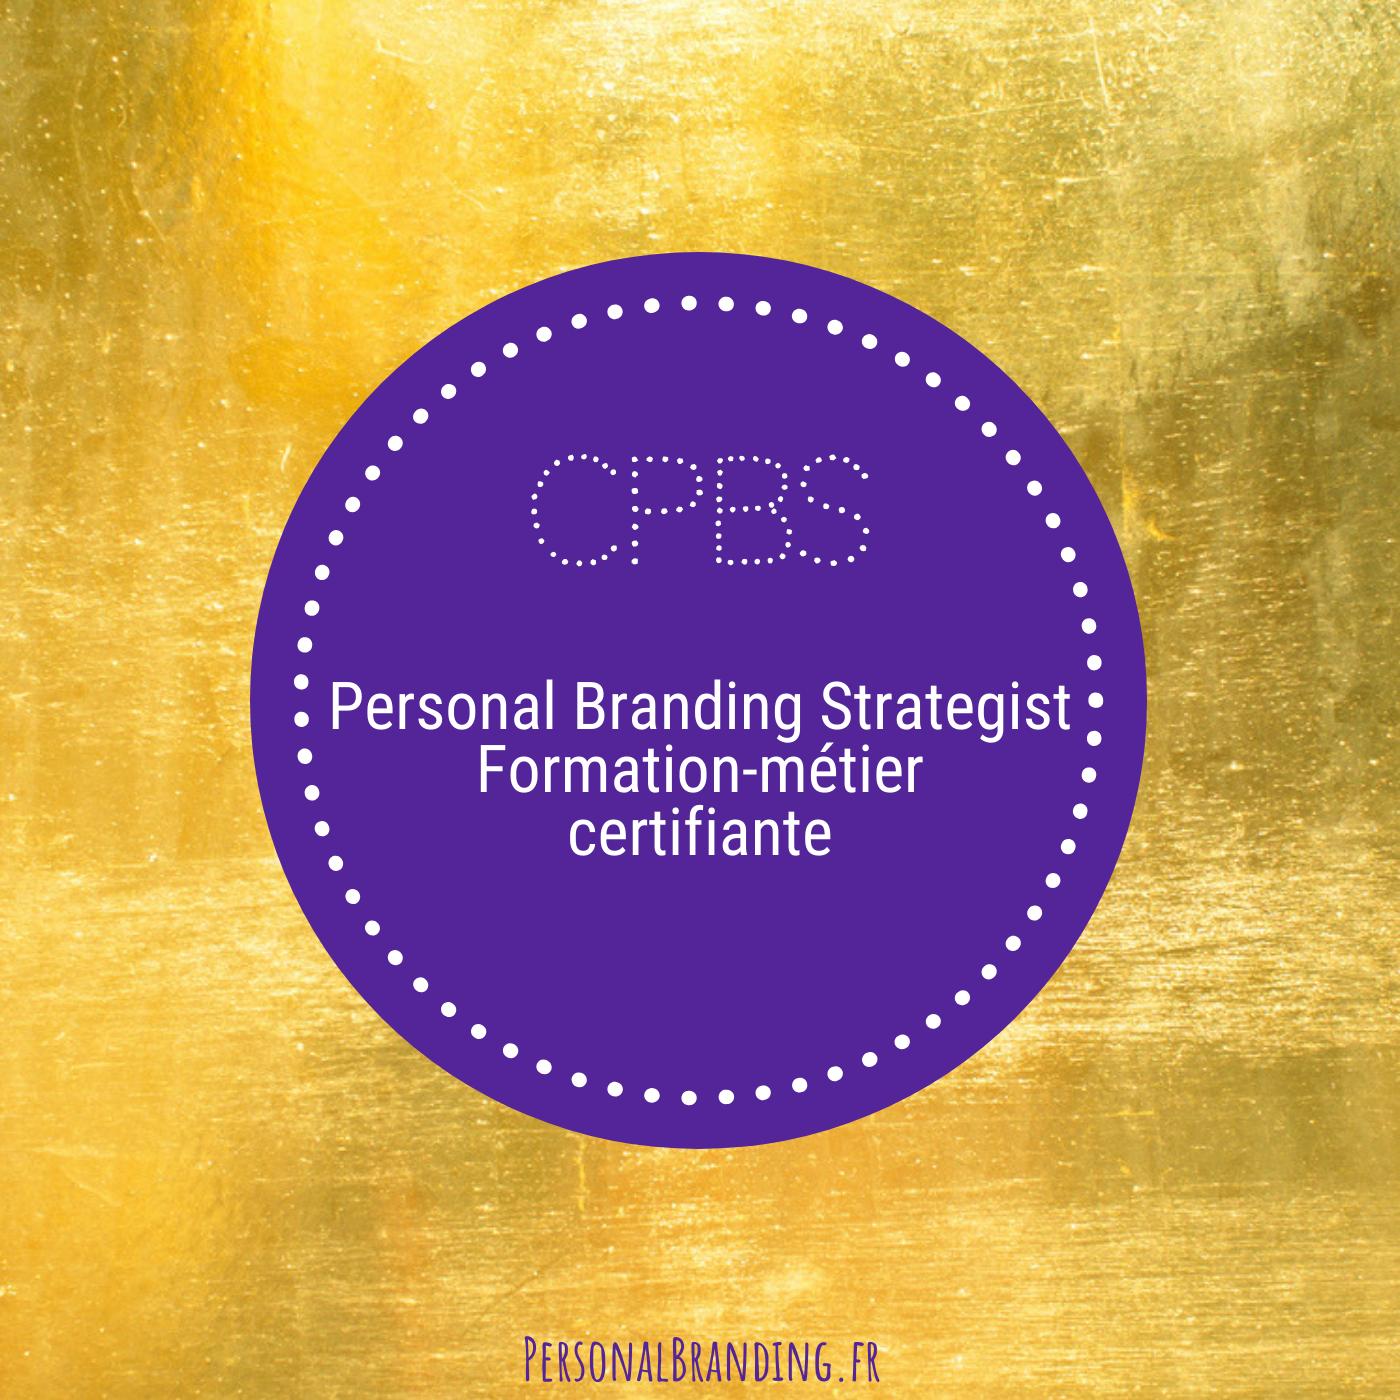 CPBS devenir Personal Branding Strategist